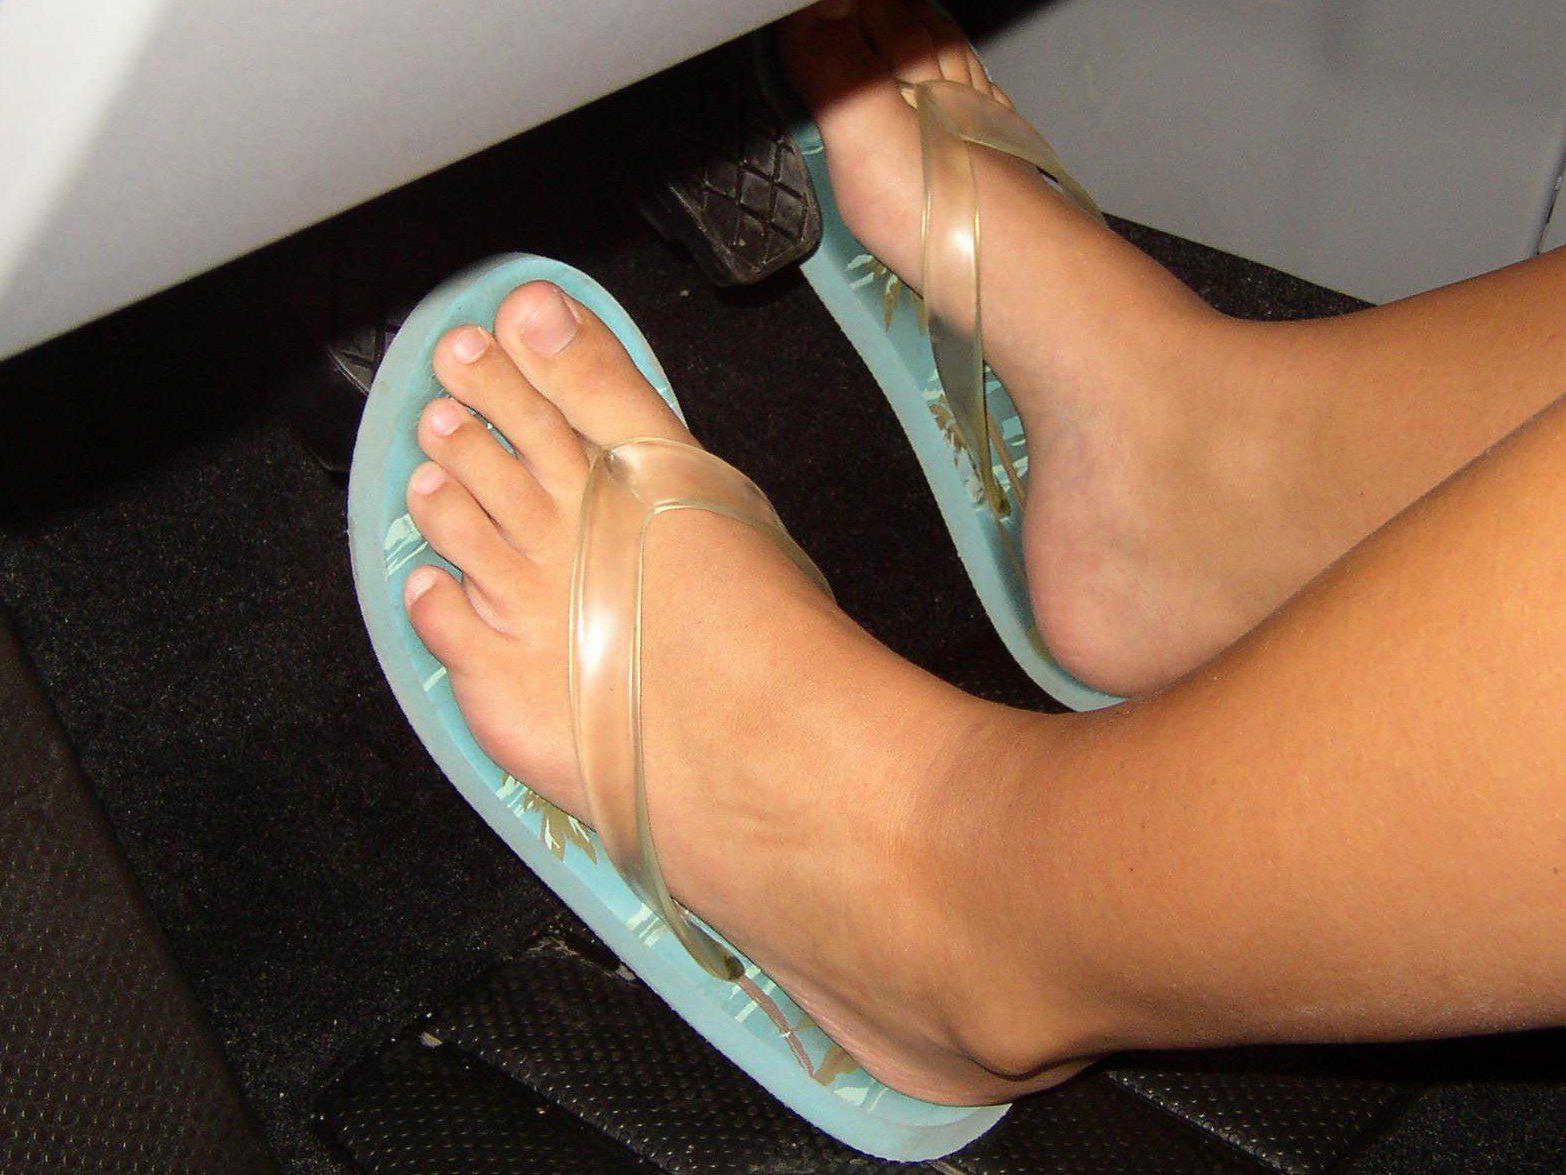 buy online 6d0b6 fc7d0 Autofahren mit Flip-Flops oder High Heels: Was ist verboten ...